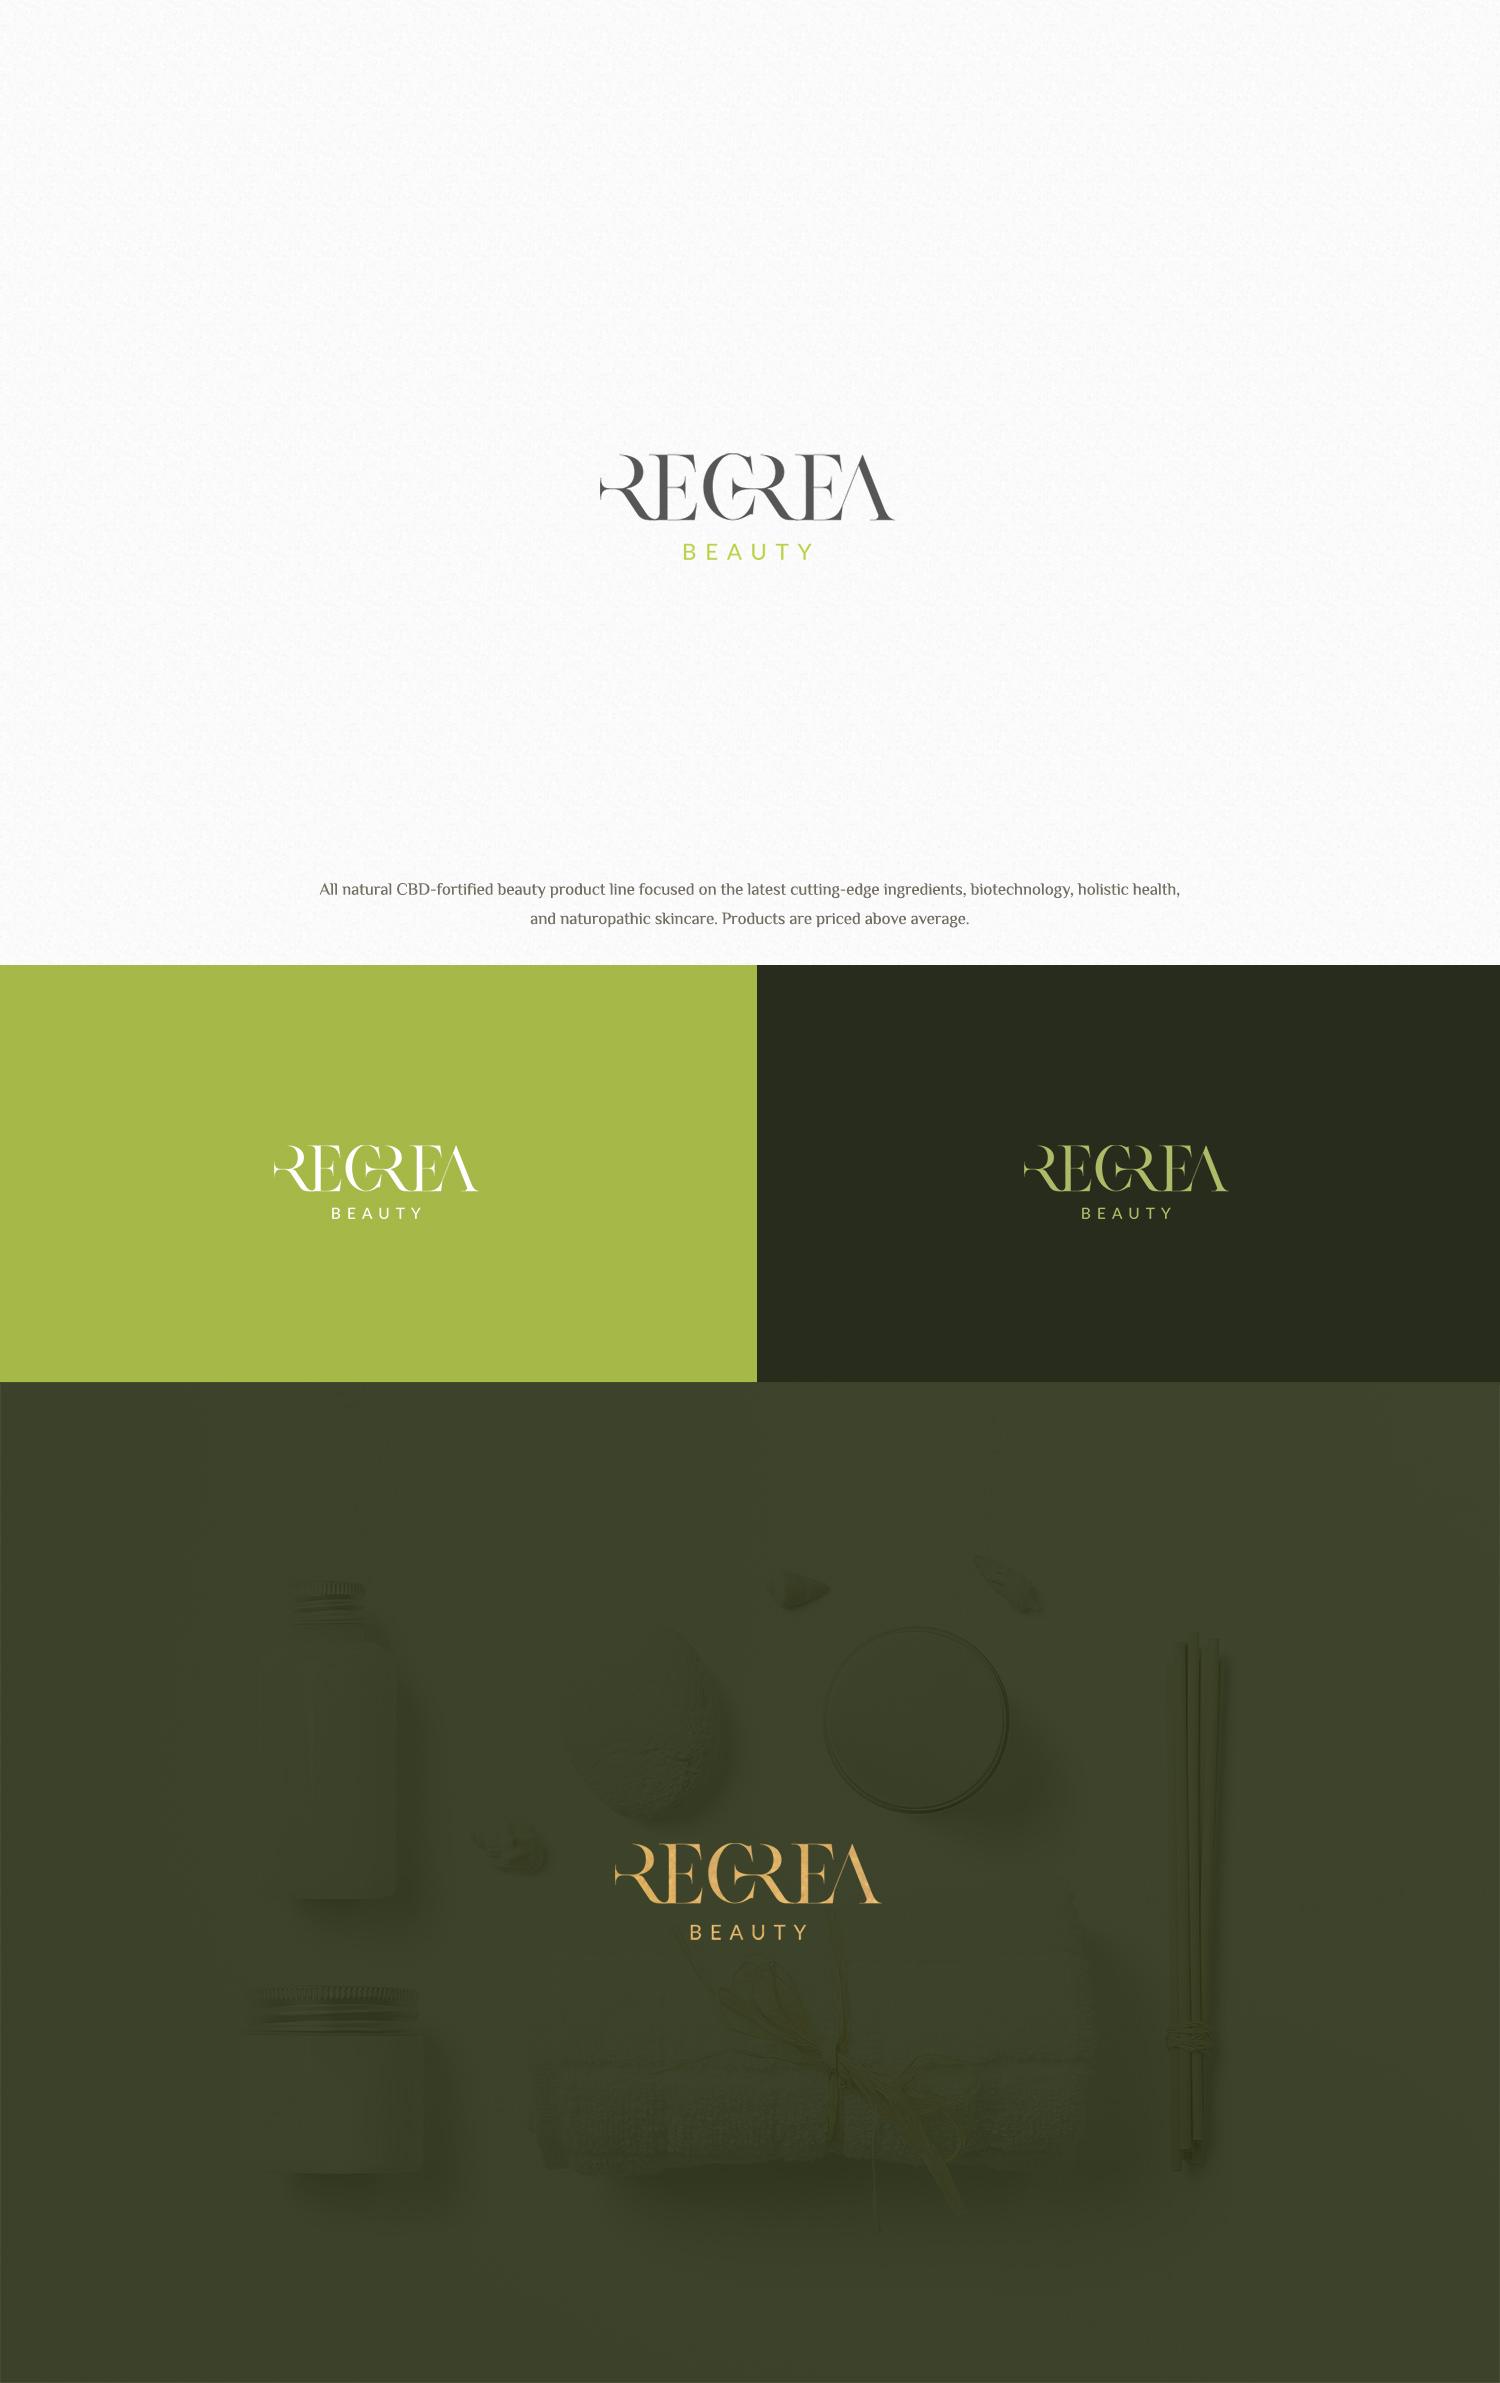 Beauty Logos Design - Cosmetic Company New Brand Logo